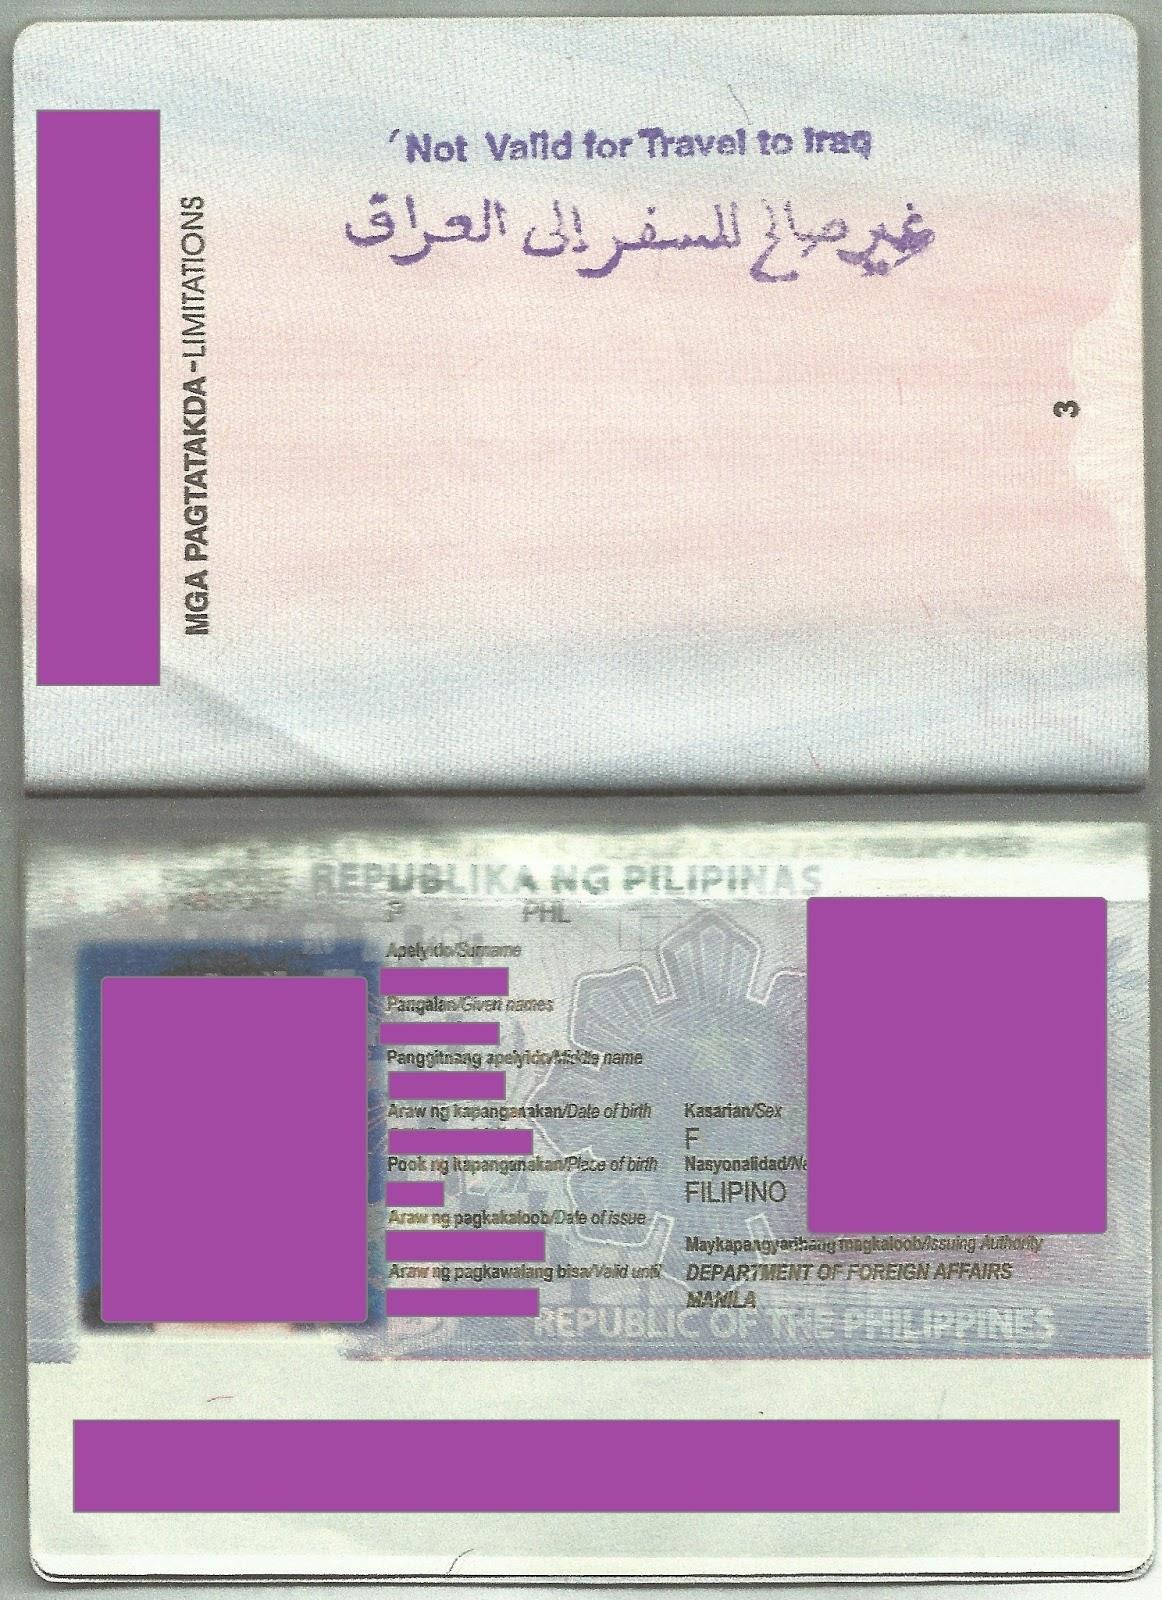 Lady Stapler How To Renew Your Philippine Passport In Riyadh